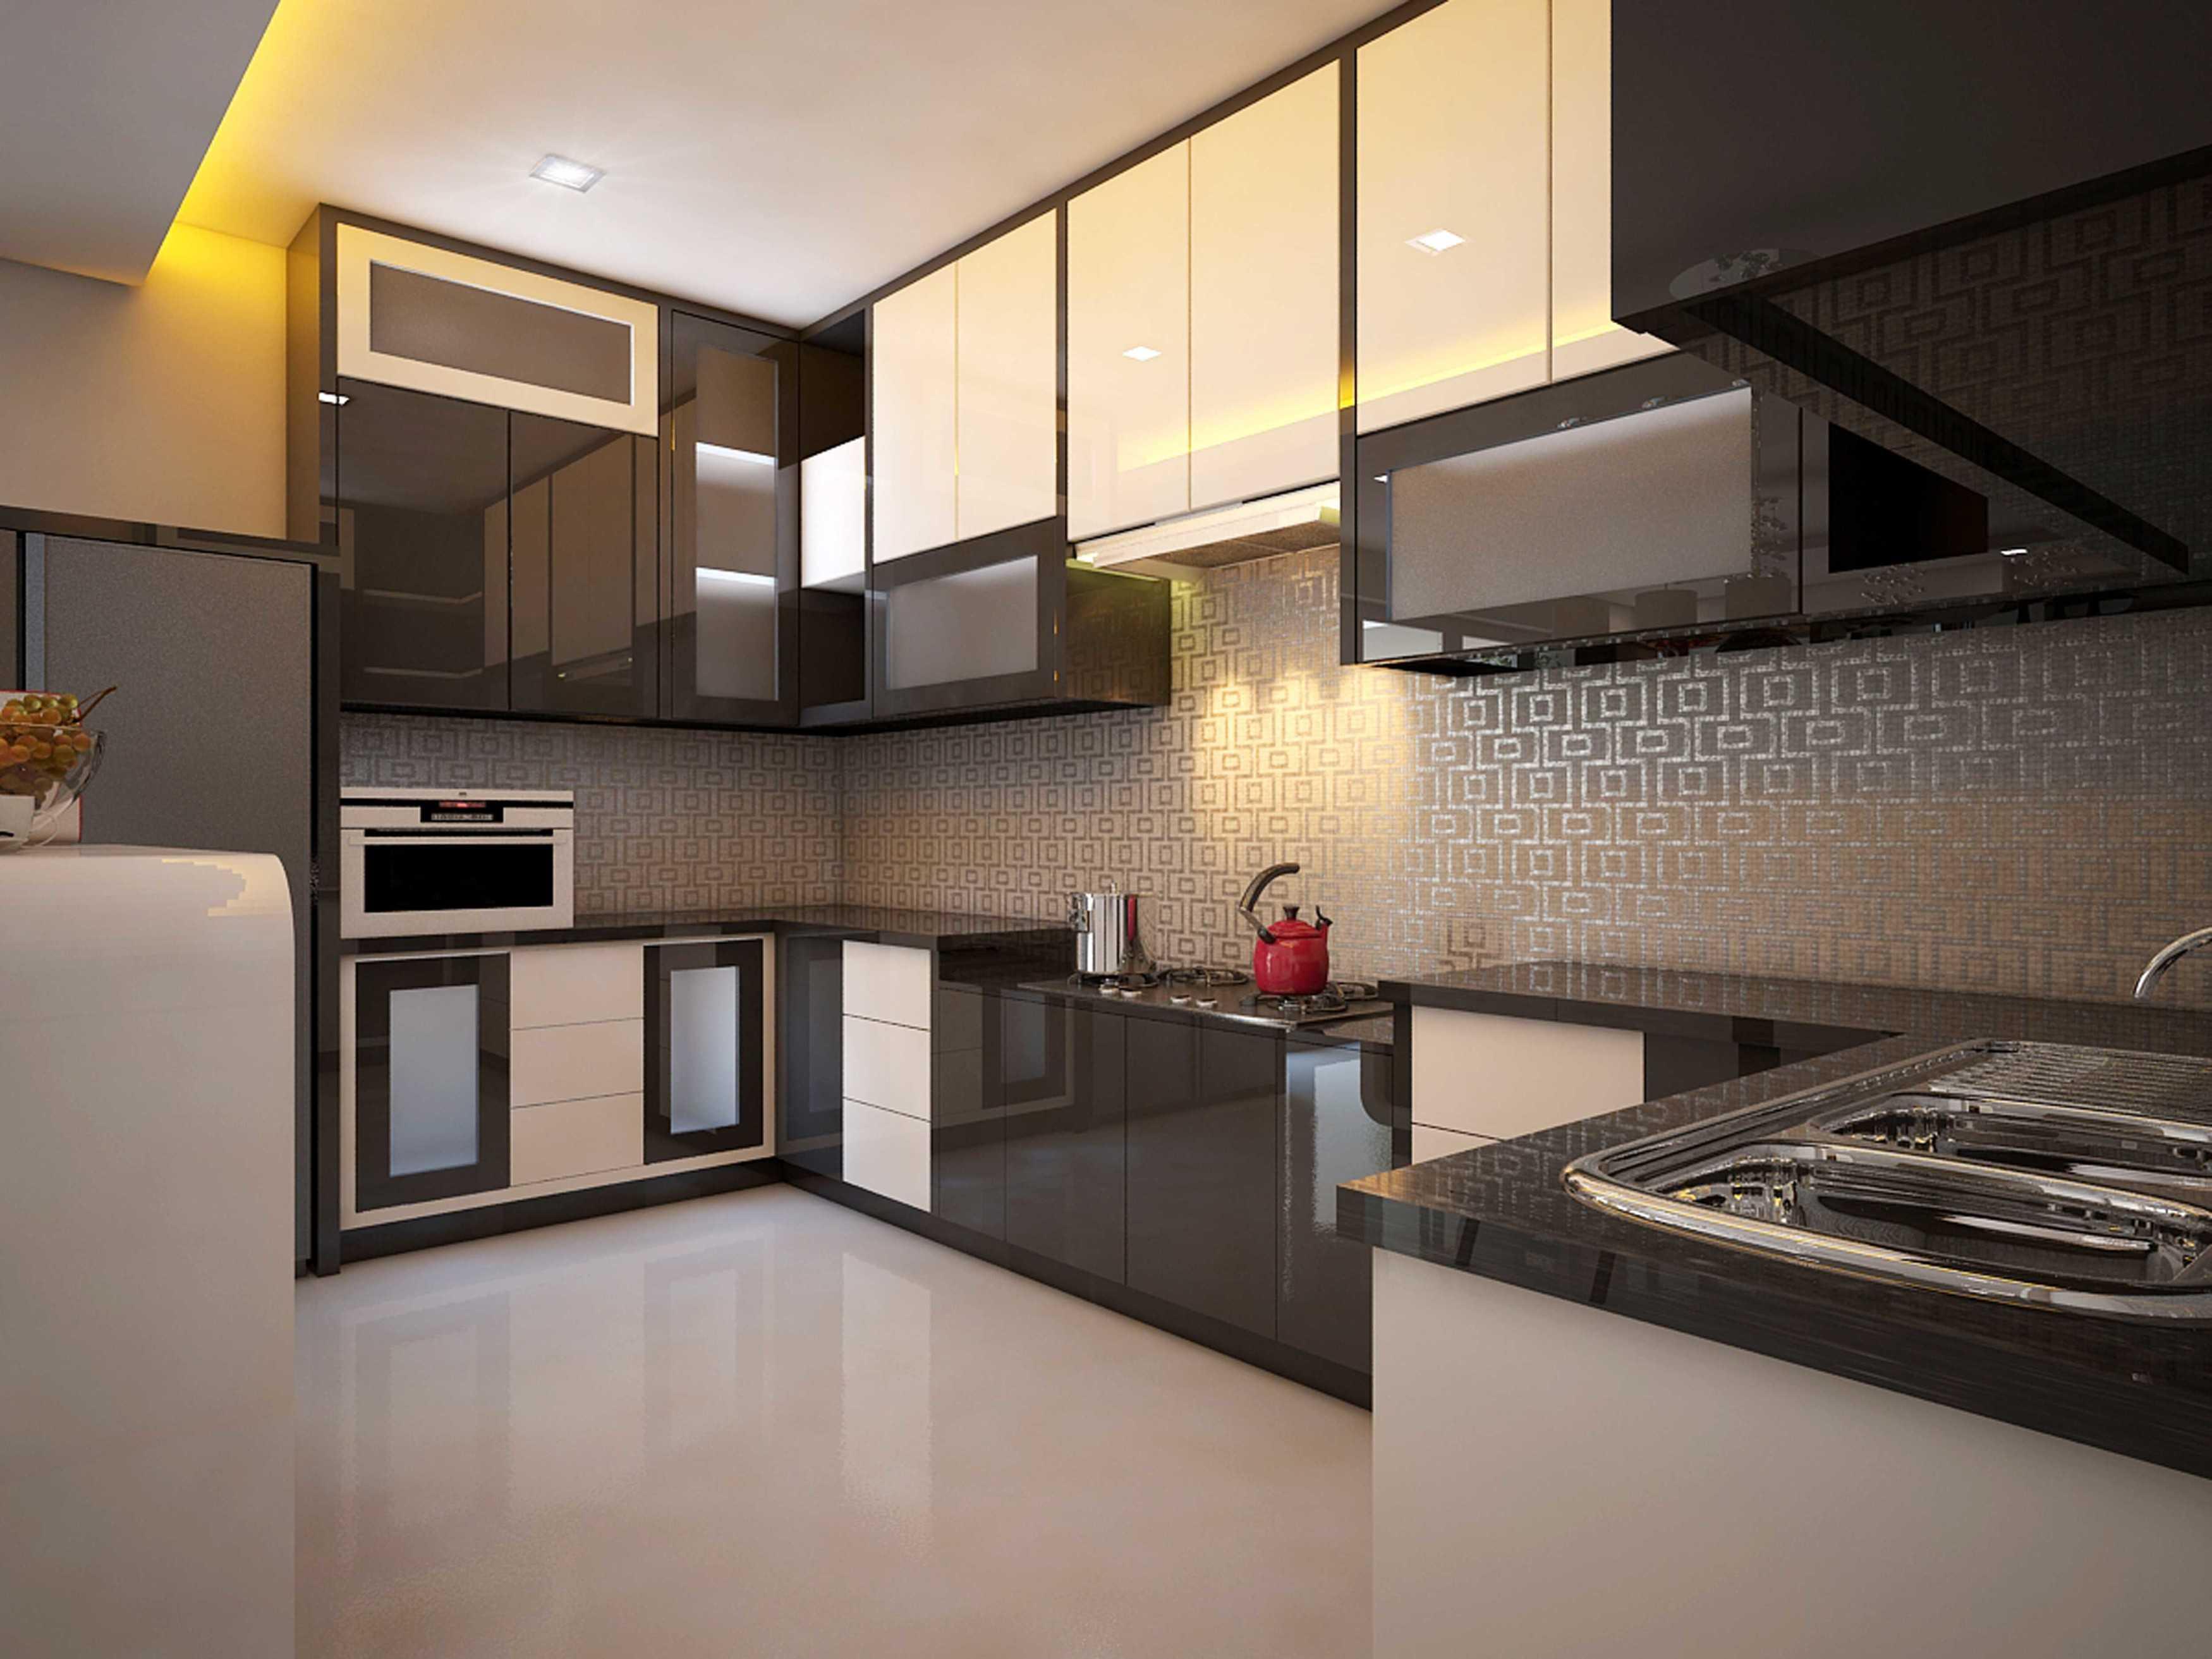 A2M Architect Indo S House Kota Makassar, Sulawesi Selatan, Indonesia Kota Makassar, Sulawesi Selatan, Indonesia Kitchen Room Modern  43625